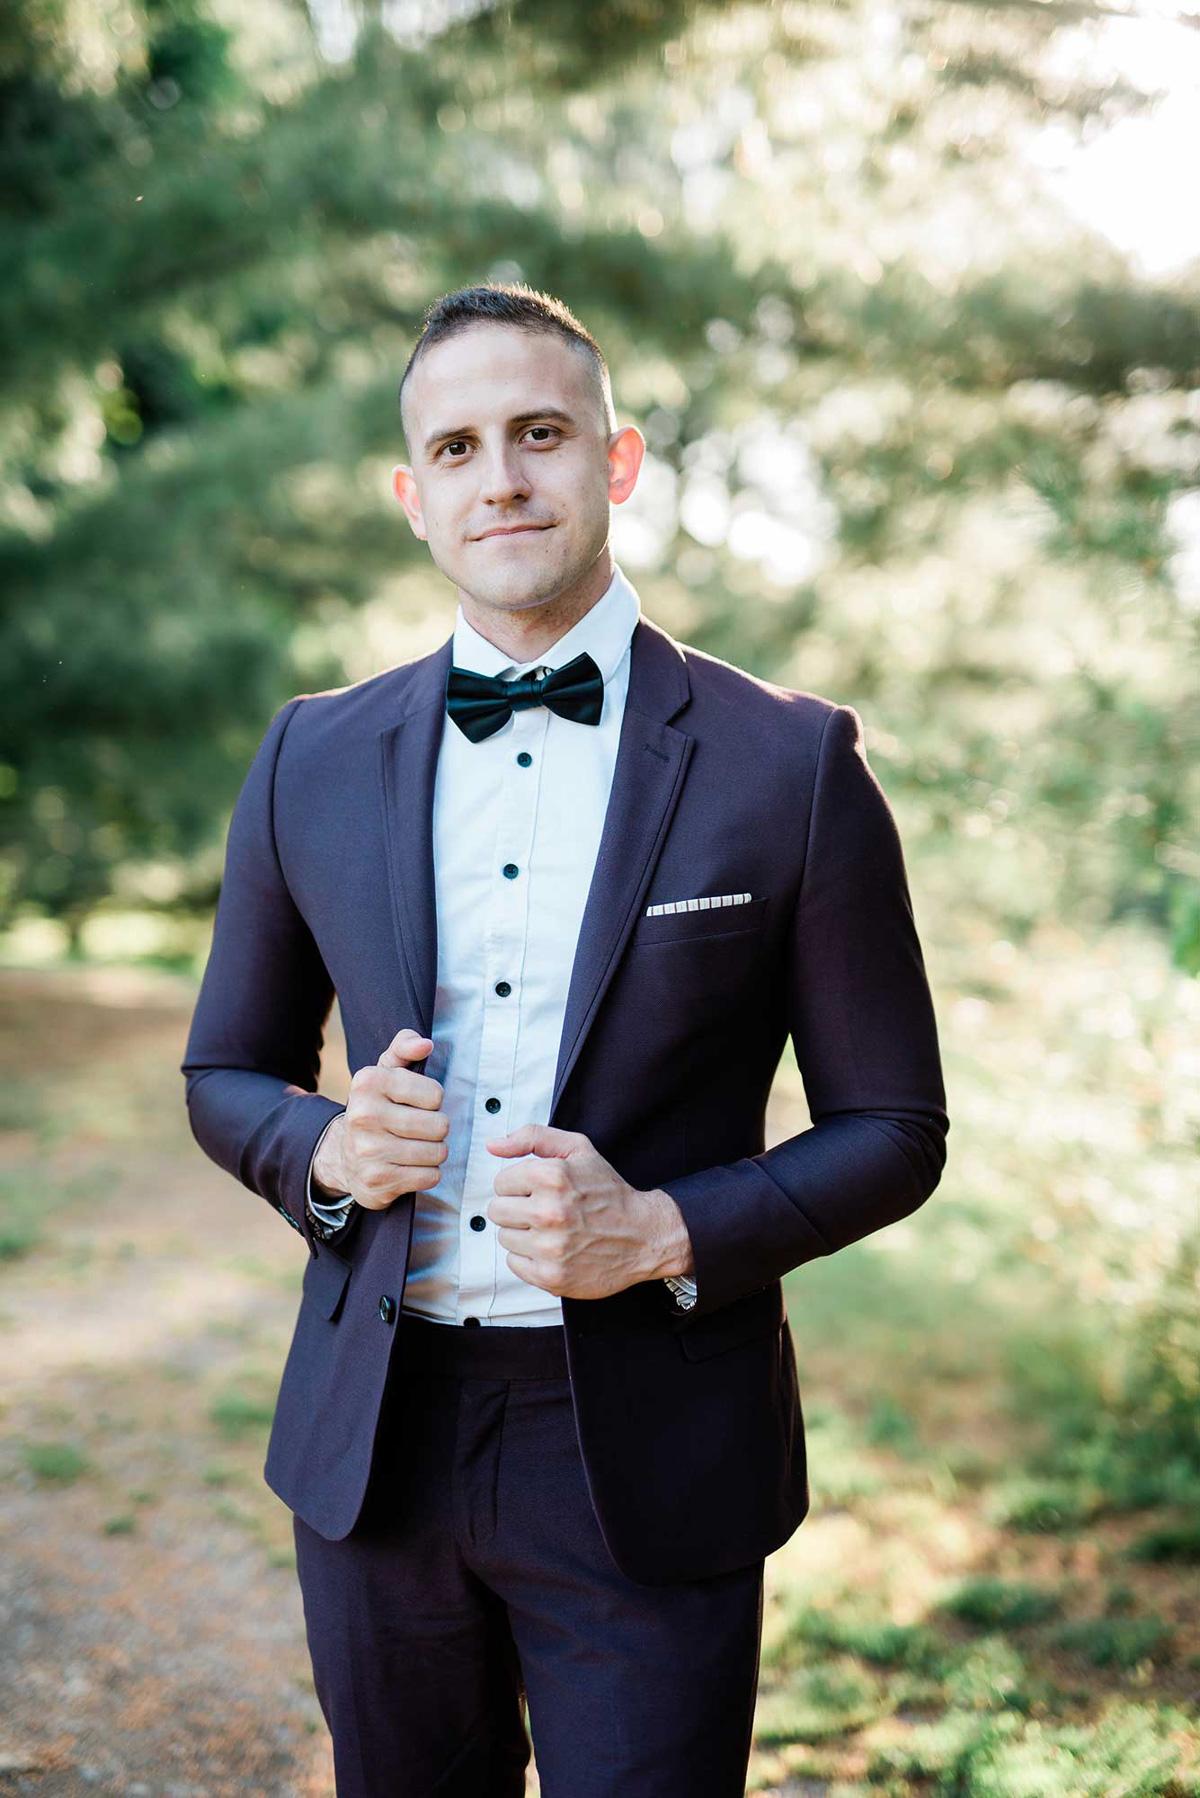 destiny-dawn-photography-vineyard-bride-swish-list-knollwood-golf-and-country-club-ancaster-wedding-editorial-27.jpg